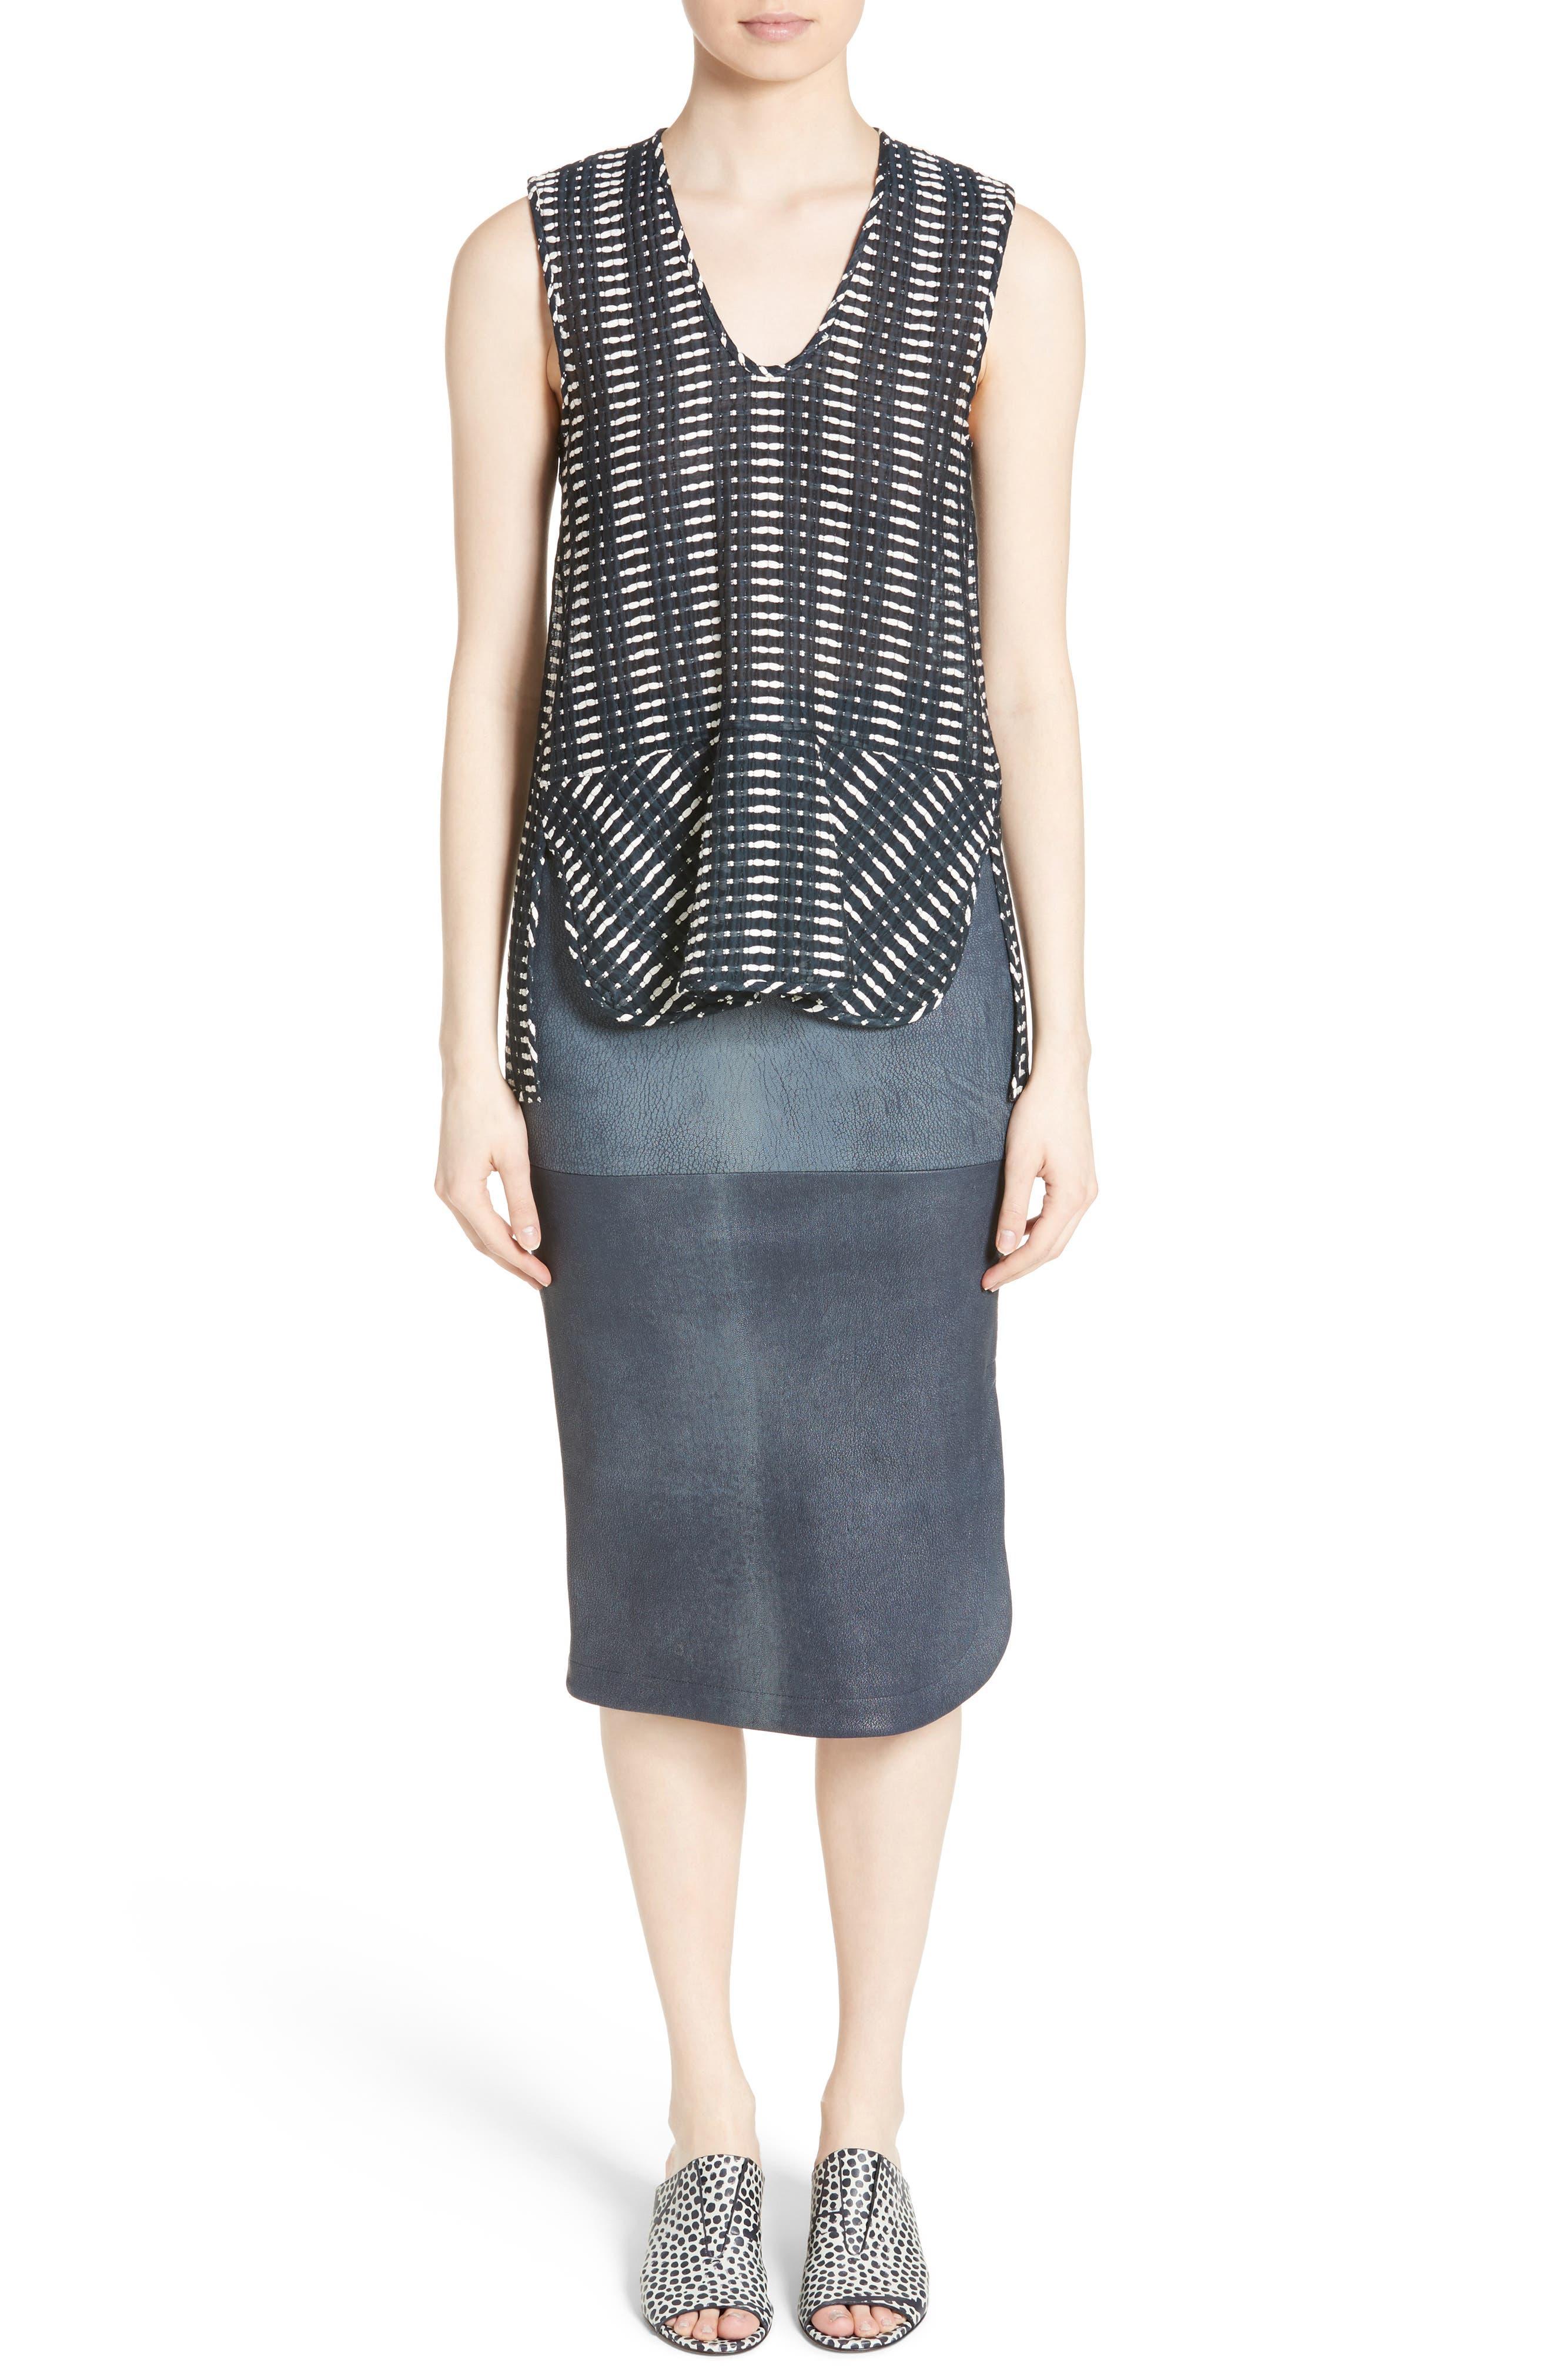 Rai Leather Curved Skirt,                             Alternate thumbnail 6, color,                             400